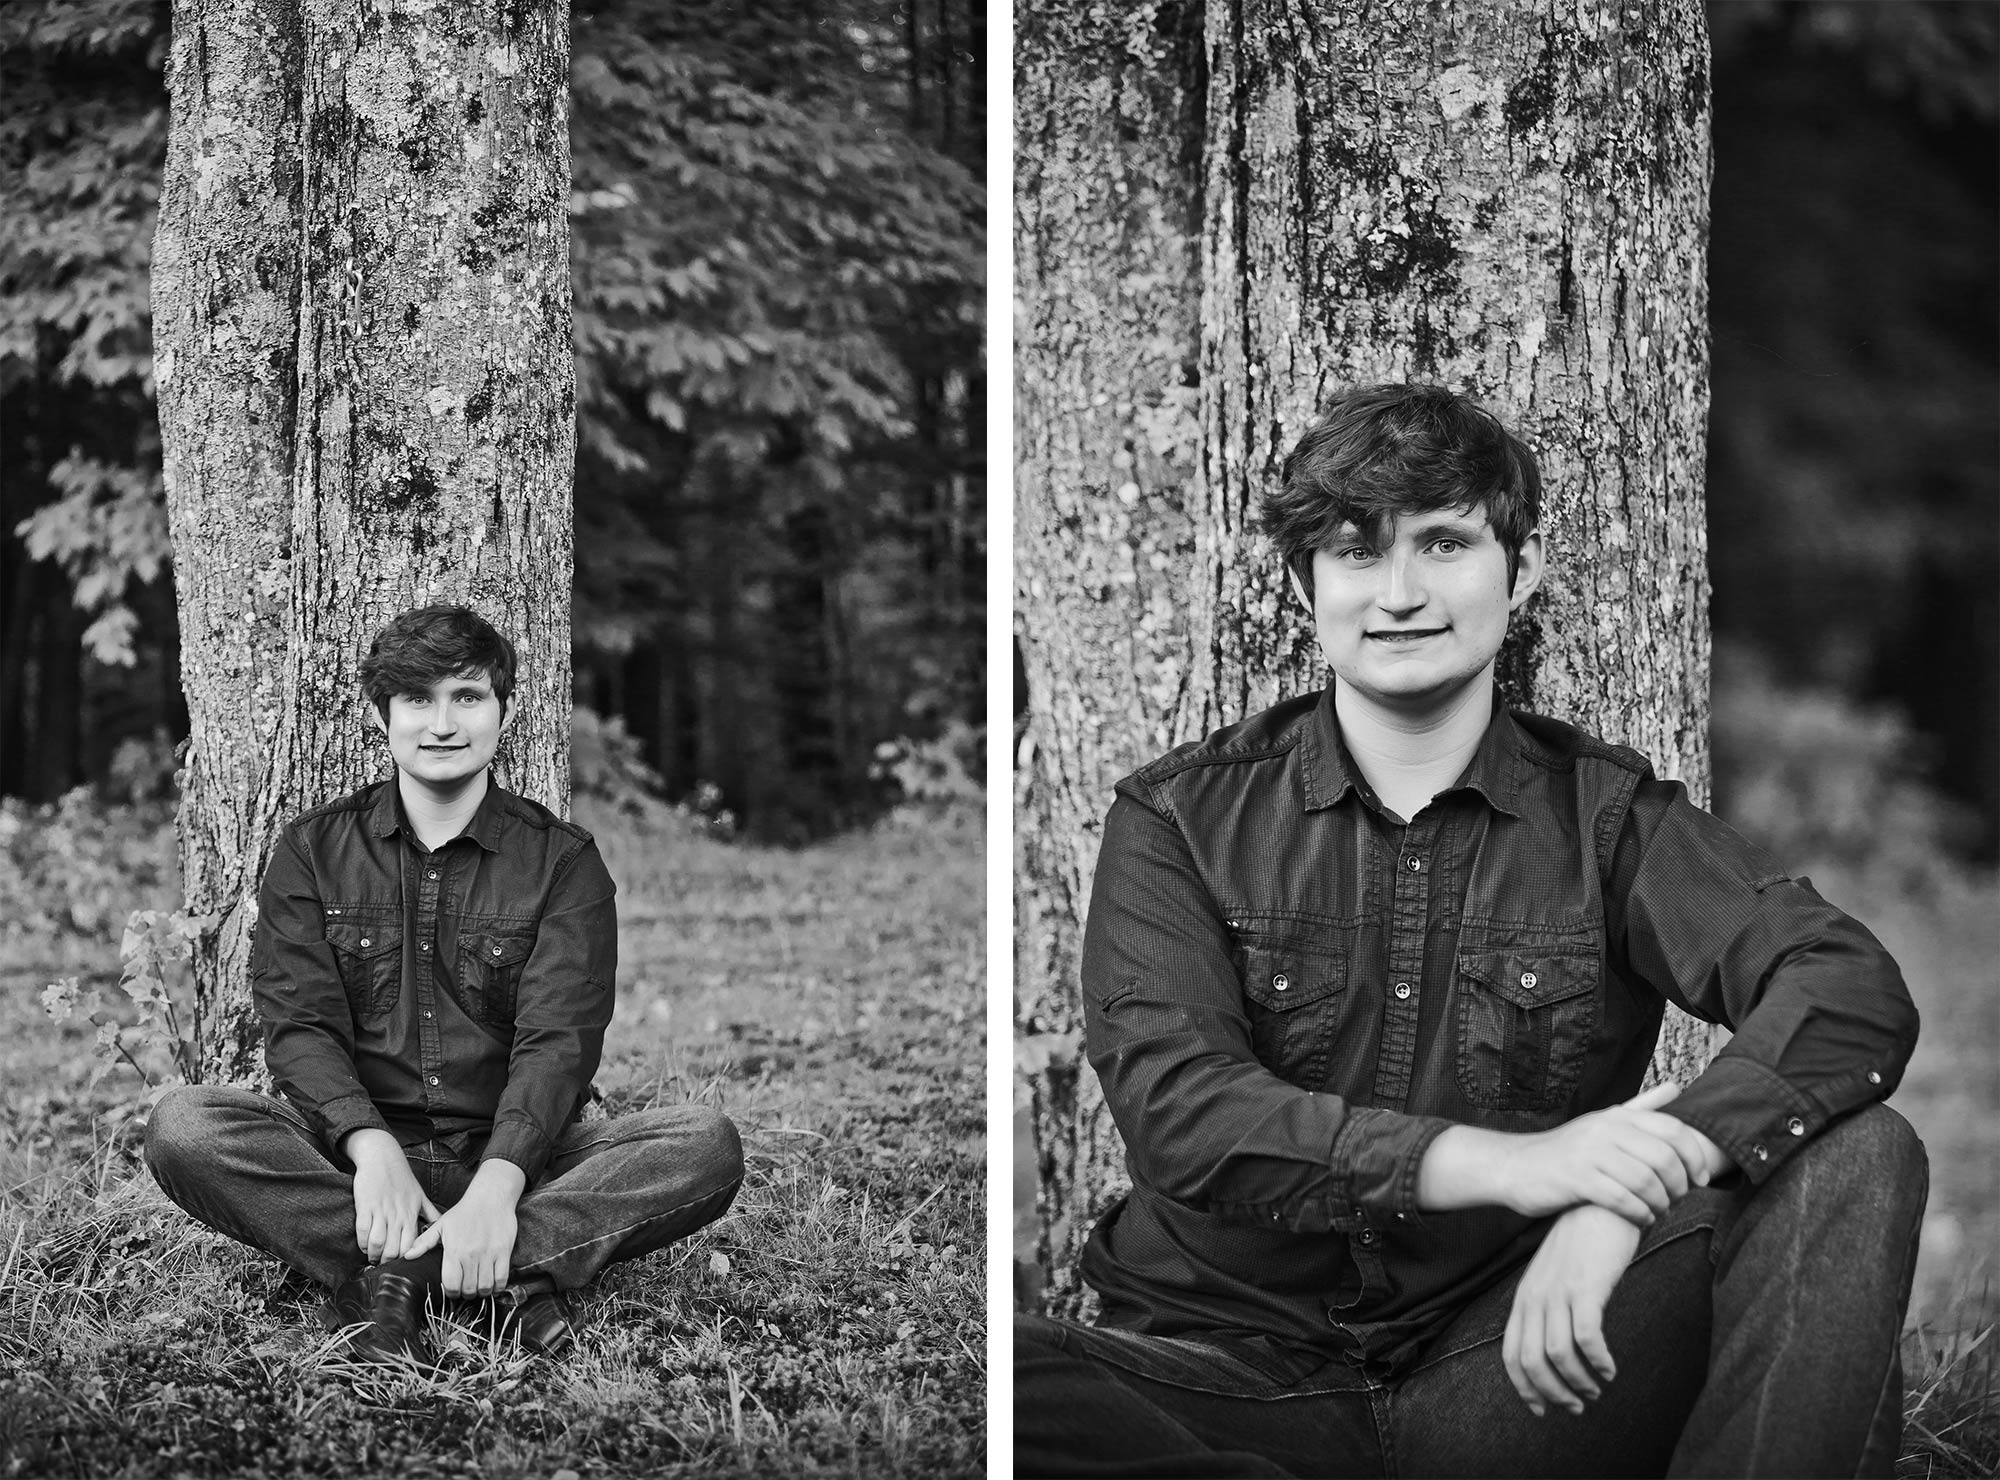 Portsmouth New Hampshire Senior Portrait Photographer | Stephen Grant Photography